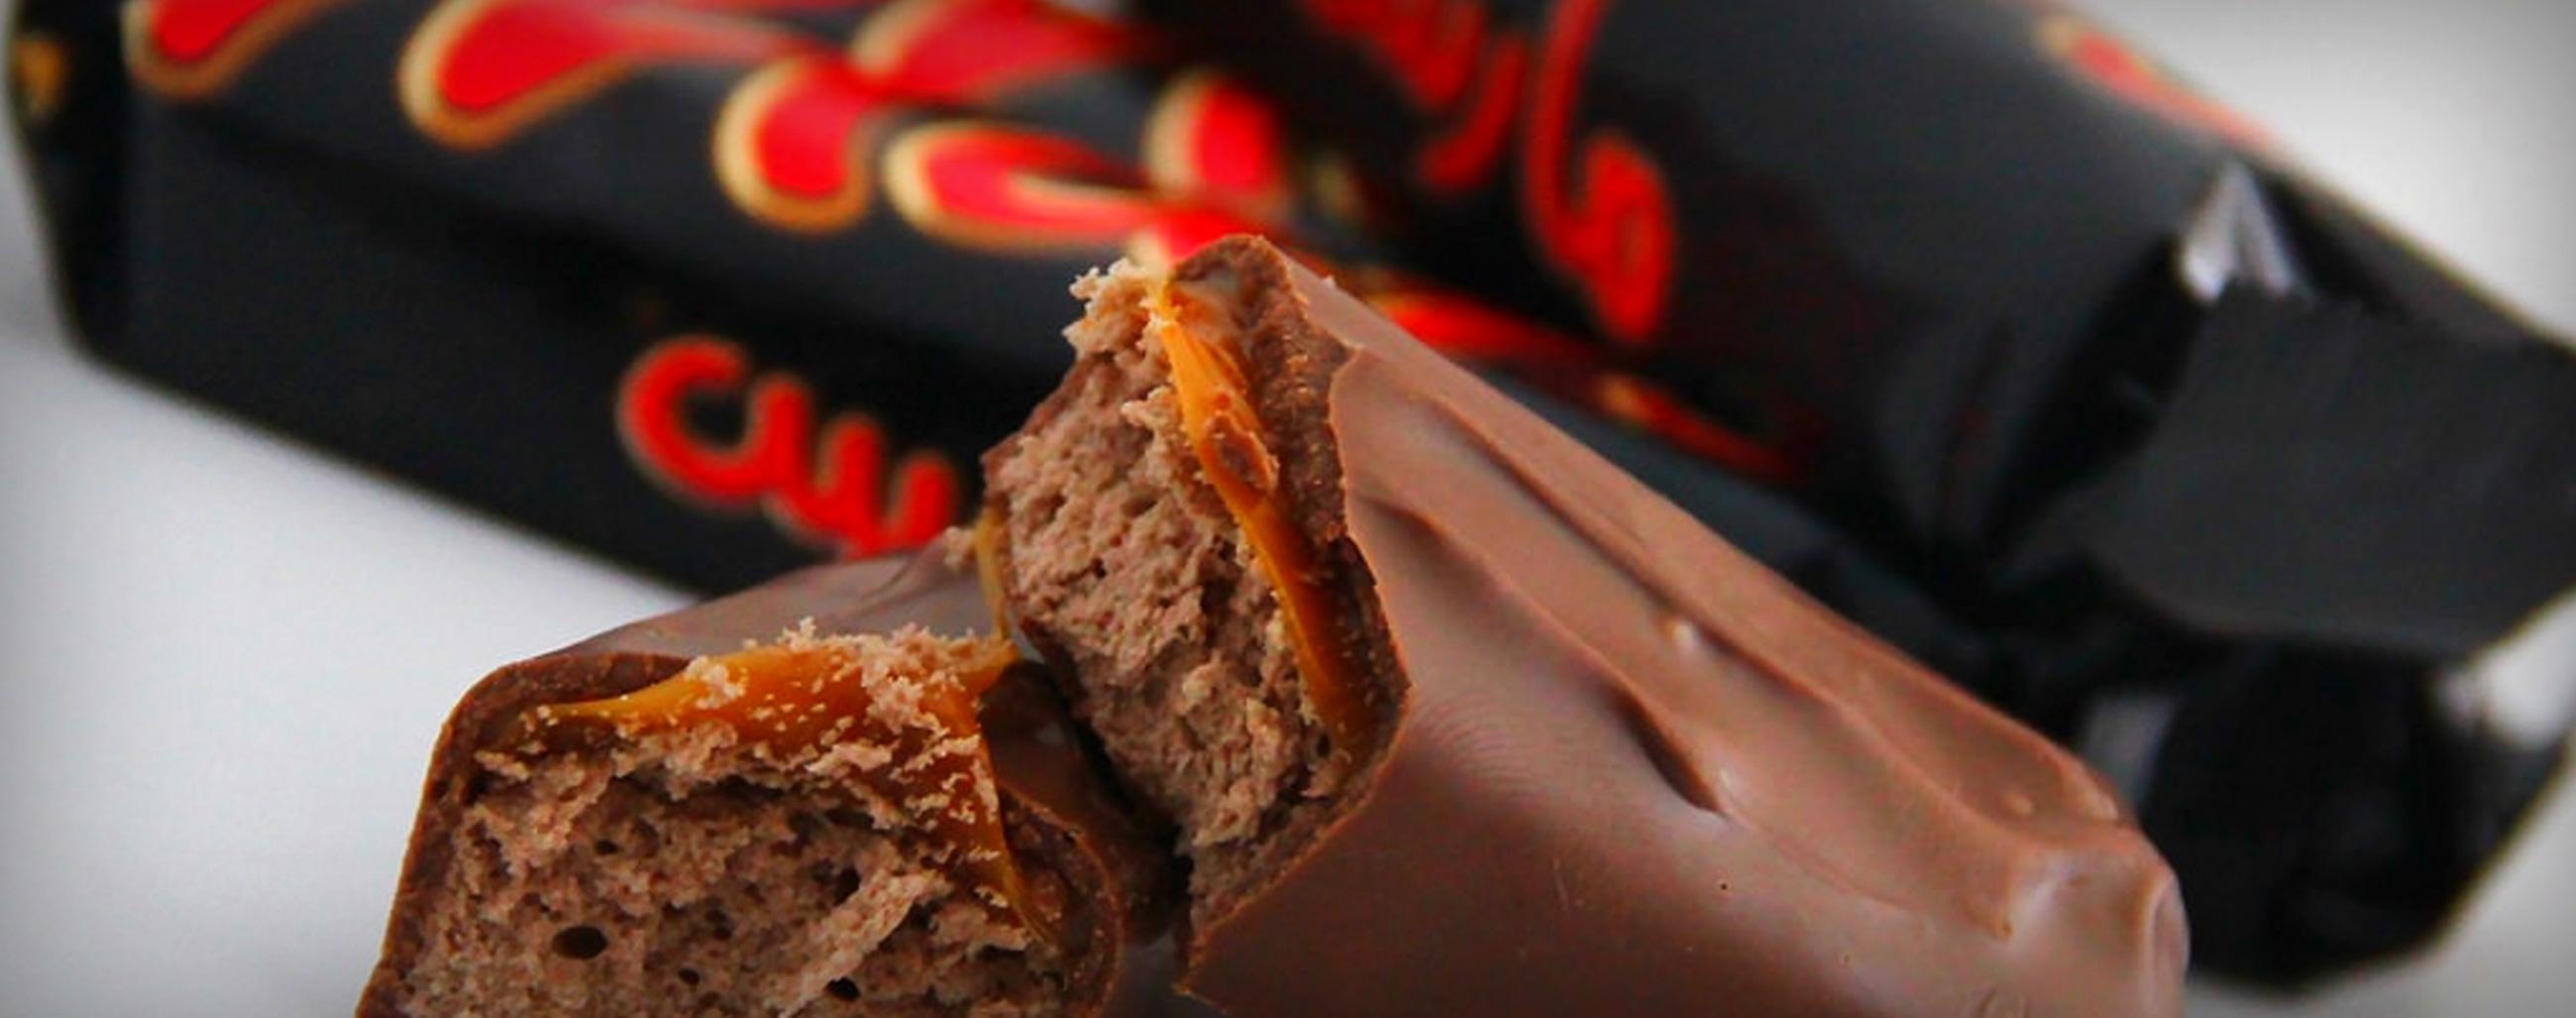 Mars Chocolate Importer & Distributor Dubai